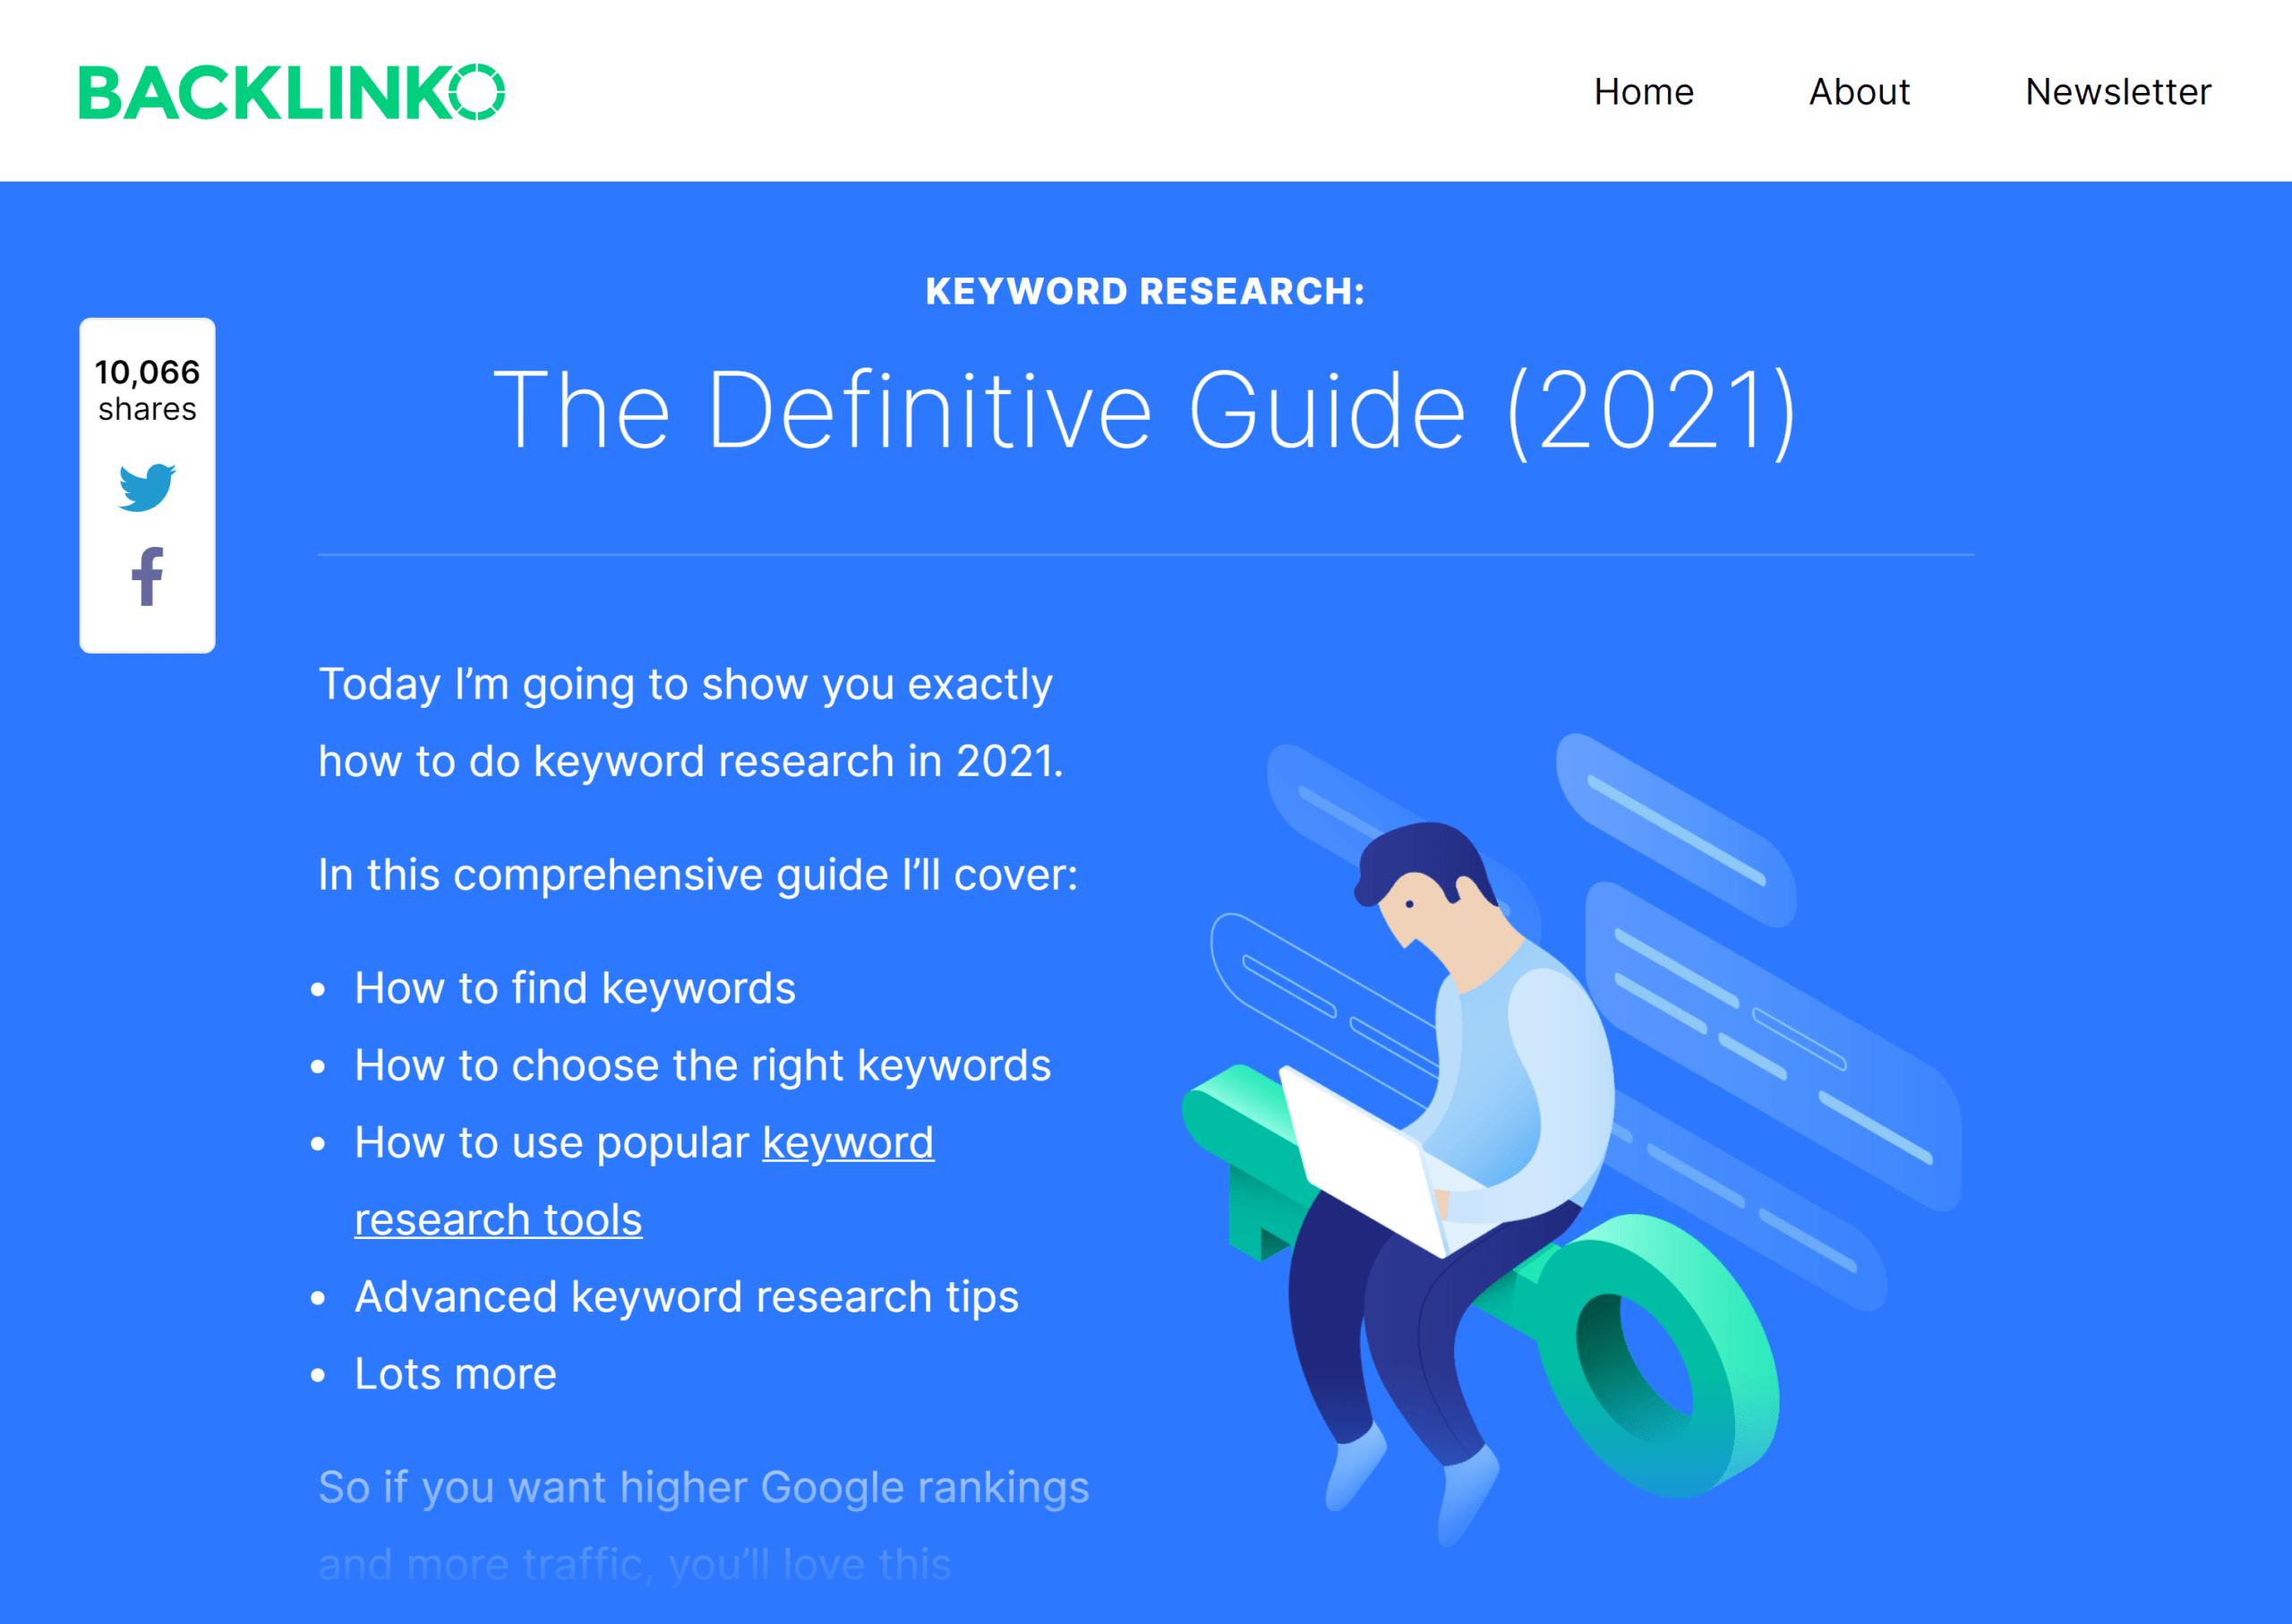 Backlinko – Keyword Research guide